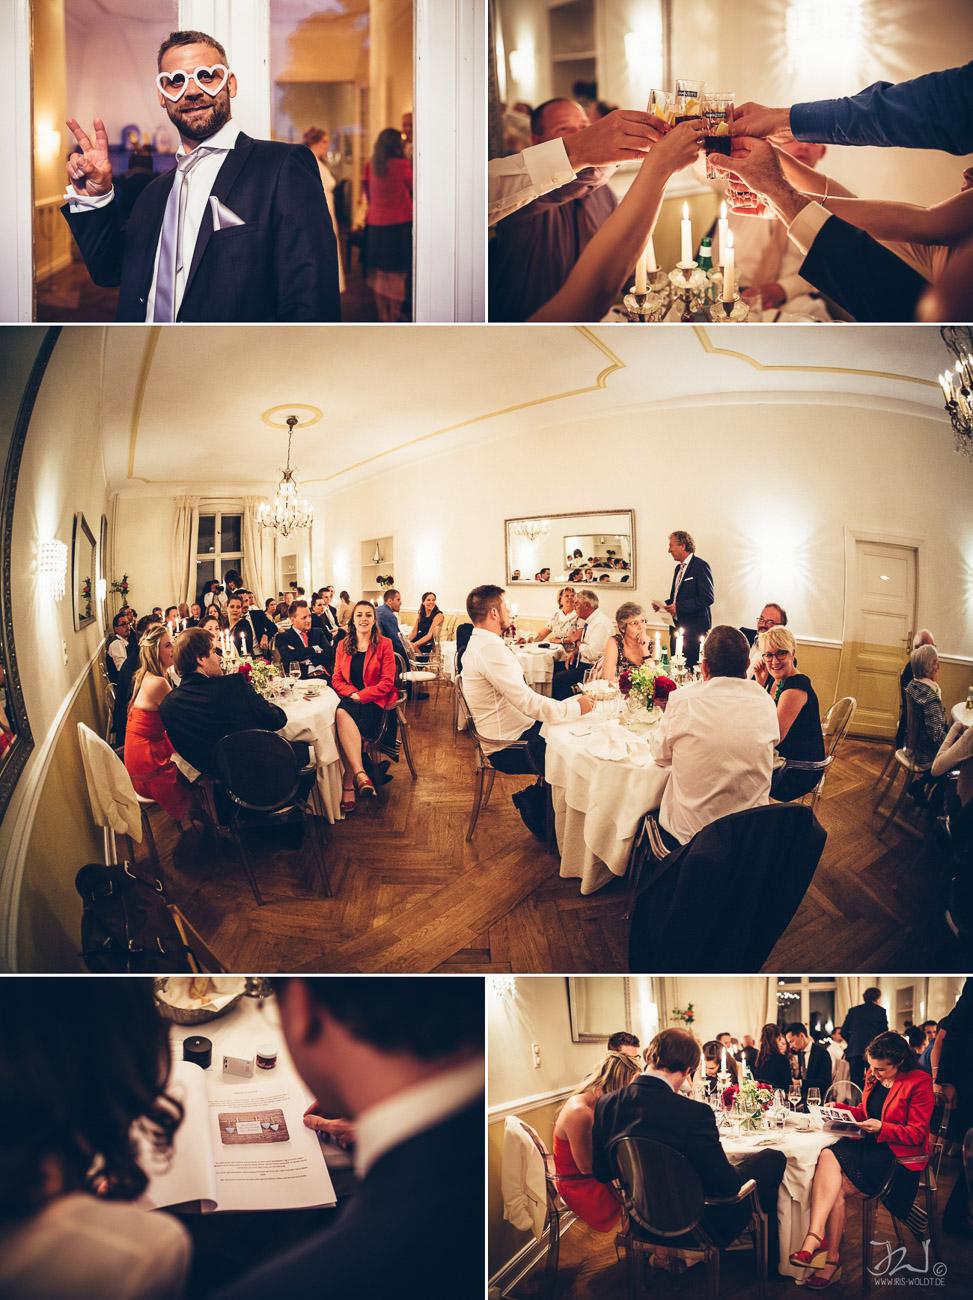 0048_Hochzeitsfotograf_Potsdam_Gut_Schloss_Golm_IrisWoldt50